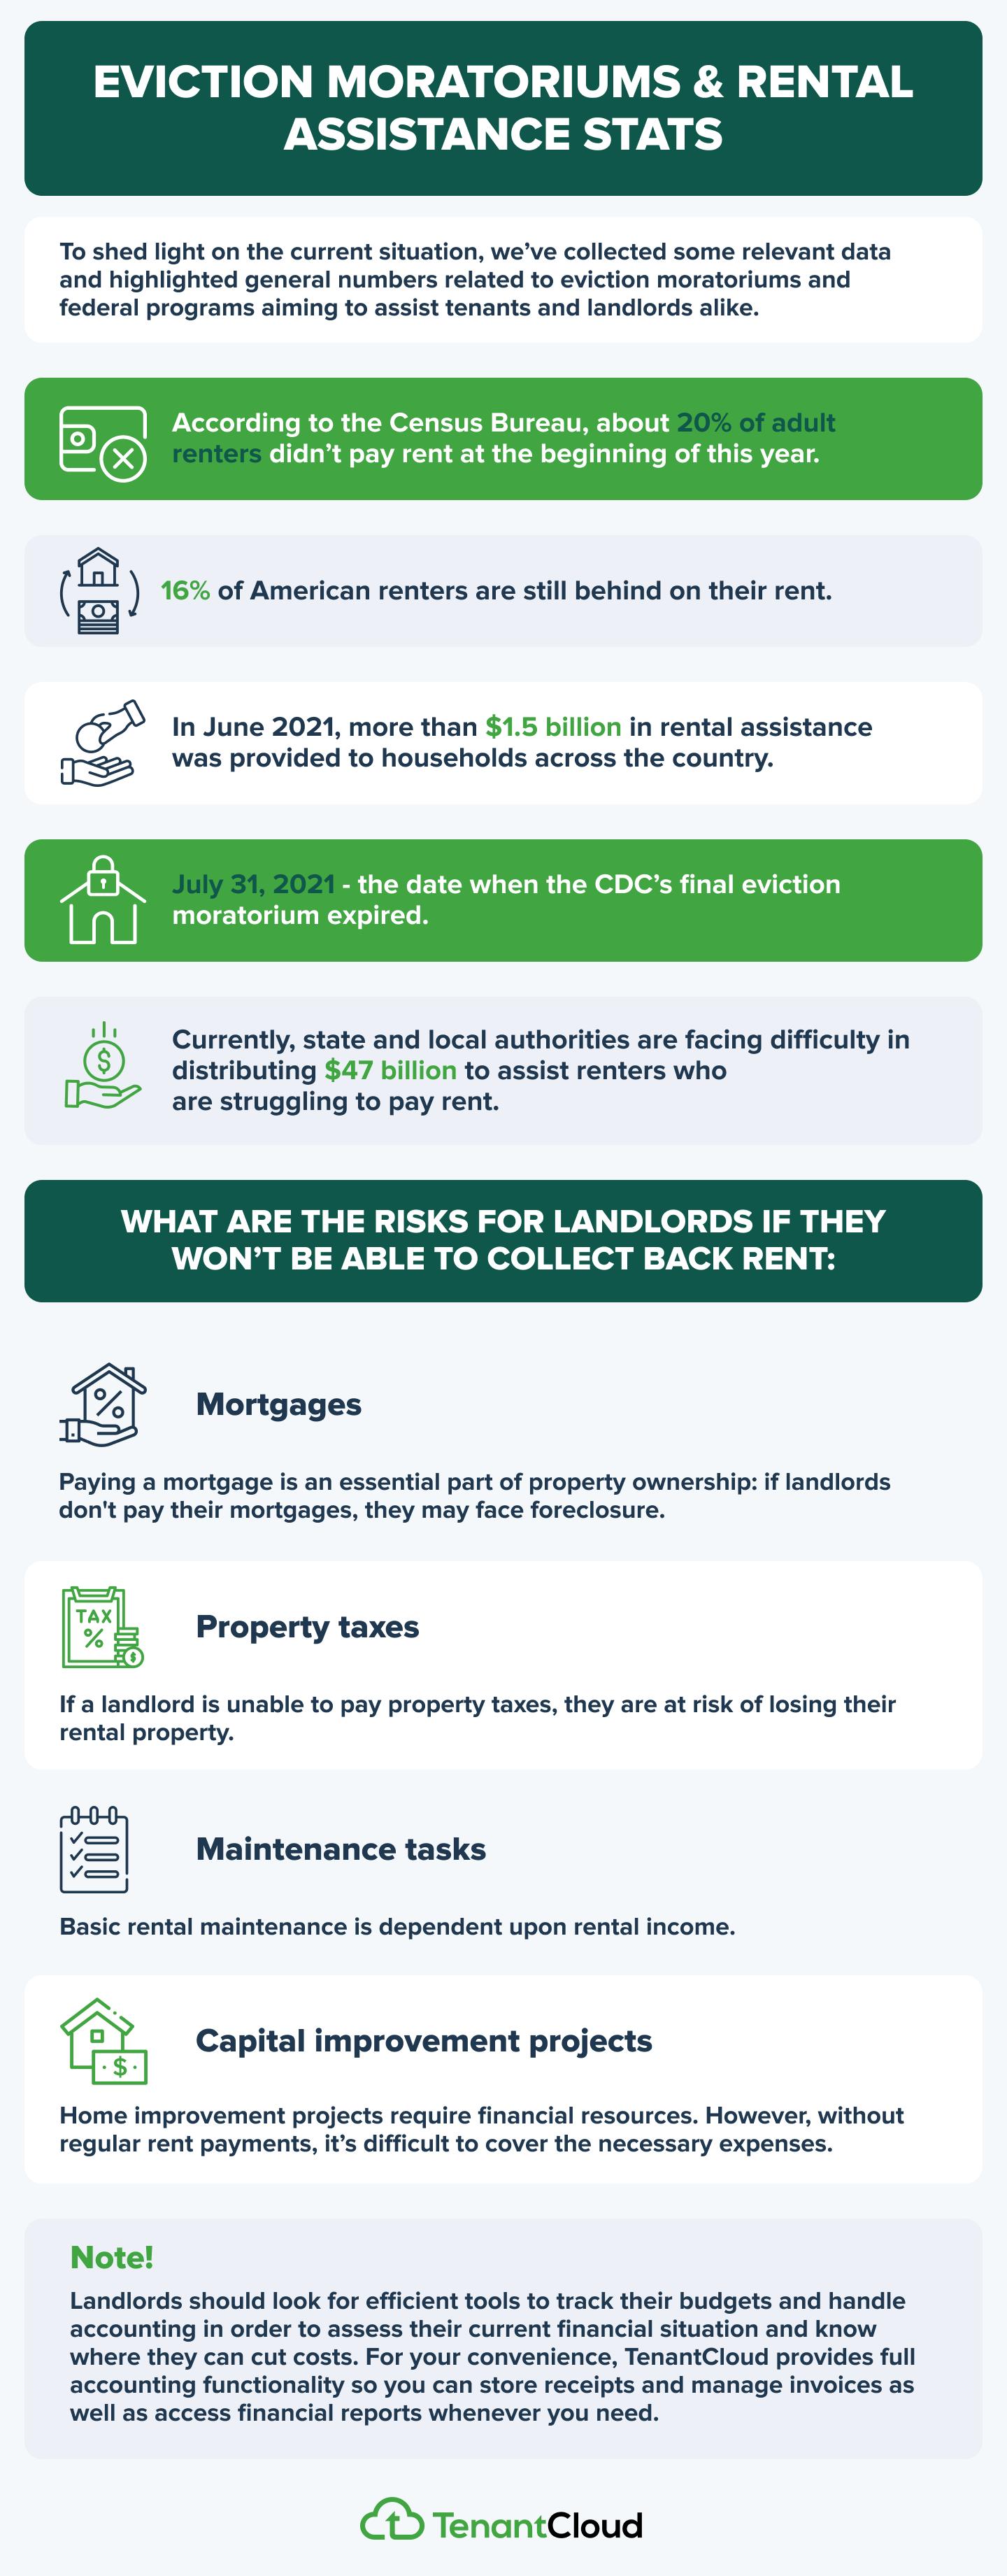 Rent Eviction Moratorium And Covid-19